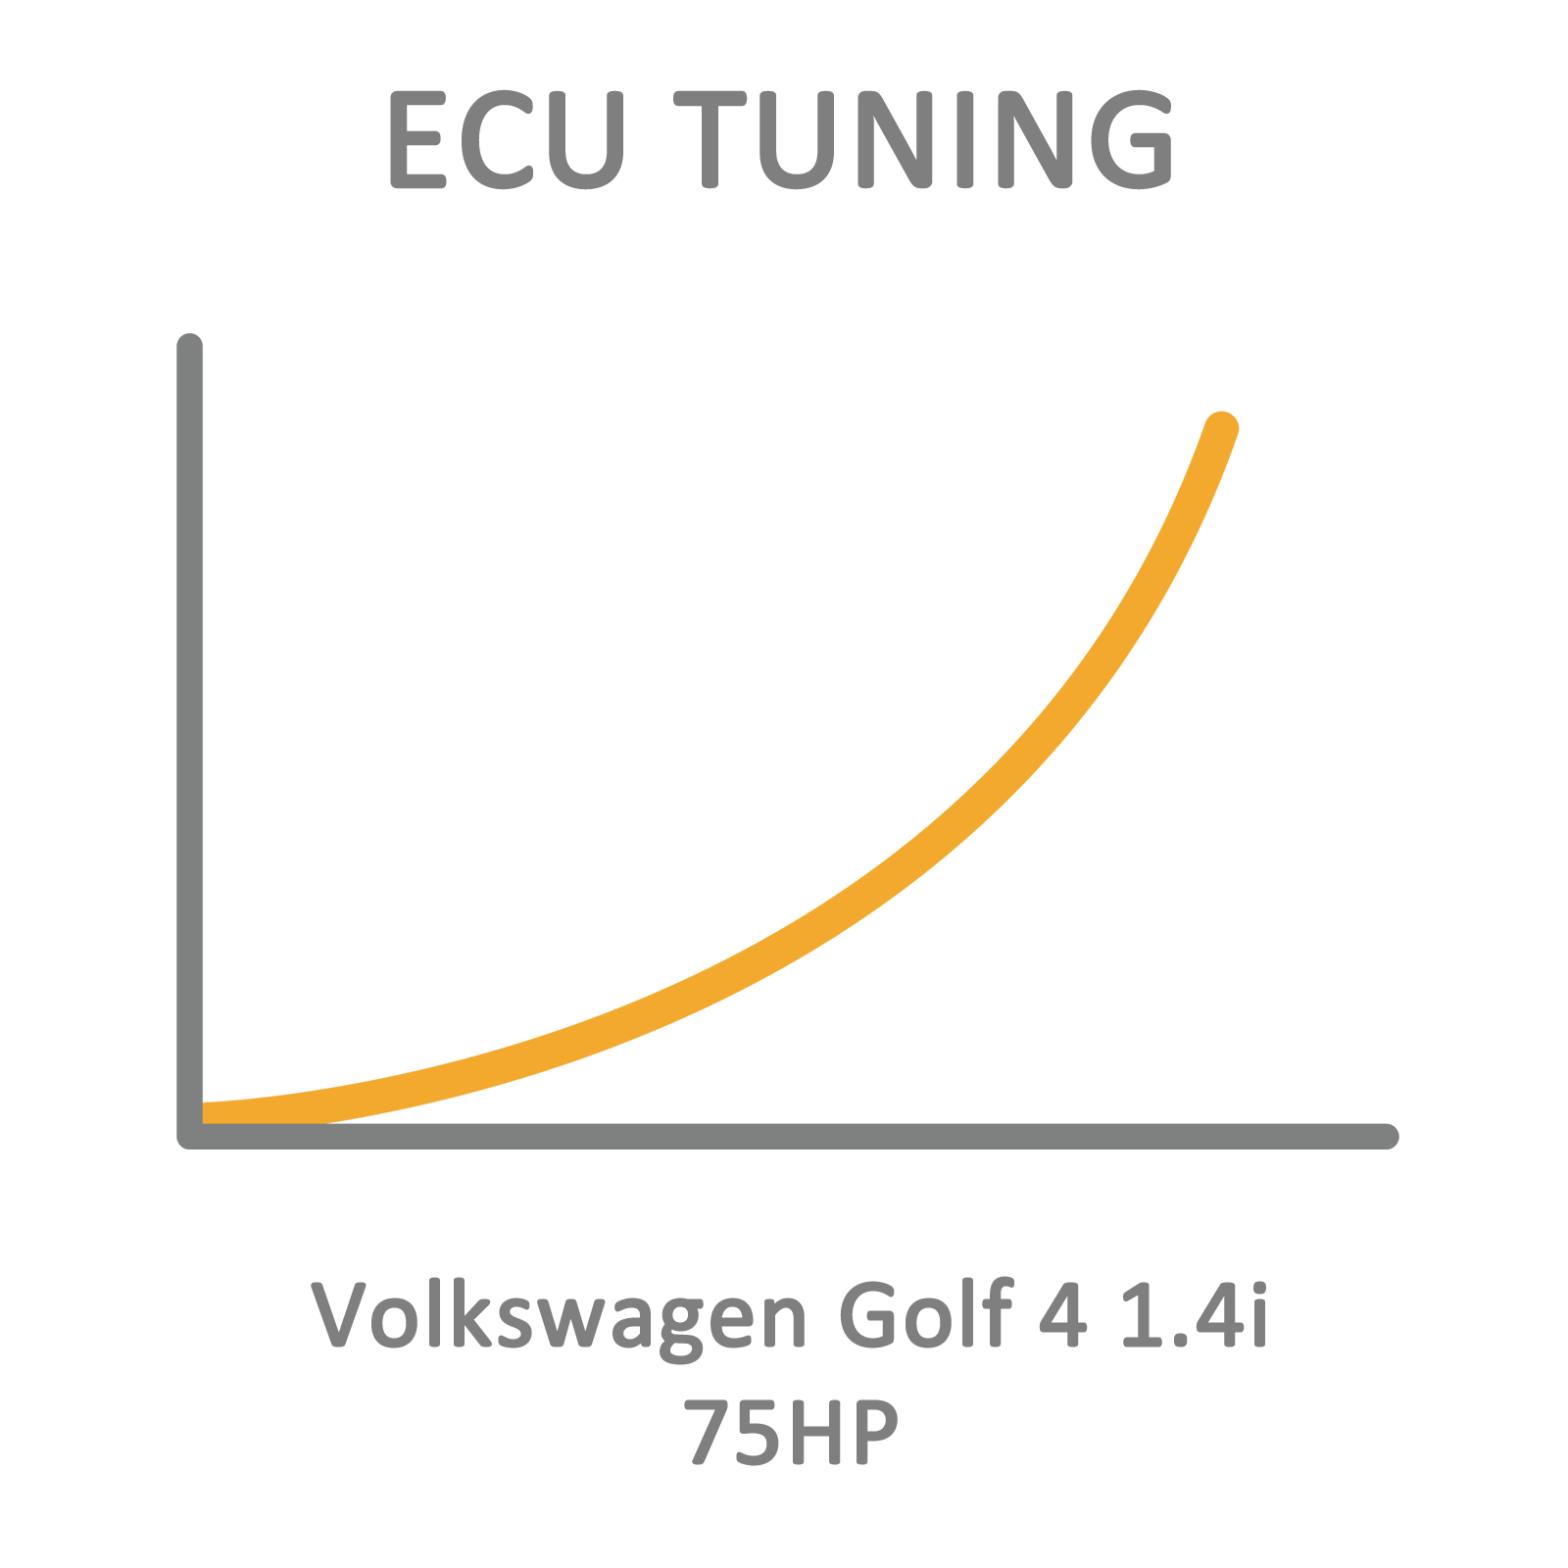 Volkswagen Golf 4 1.4i 75HP ECU Tuning Remapping Programming